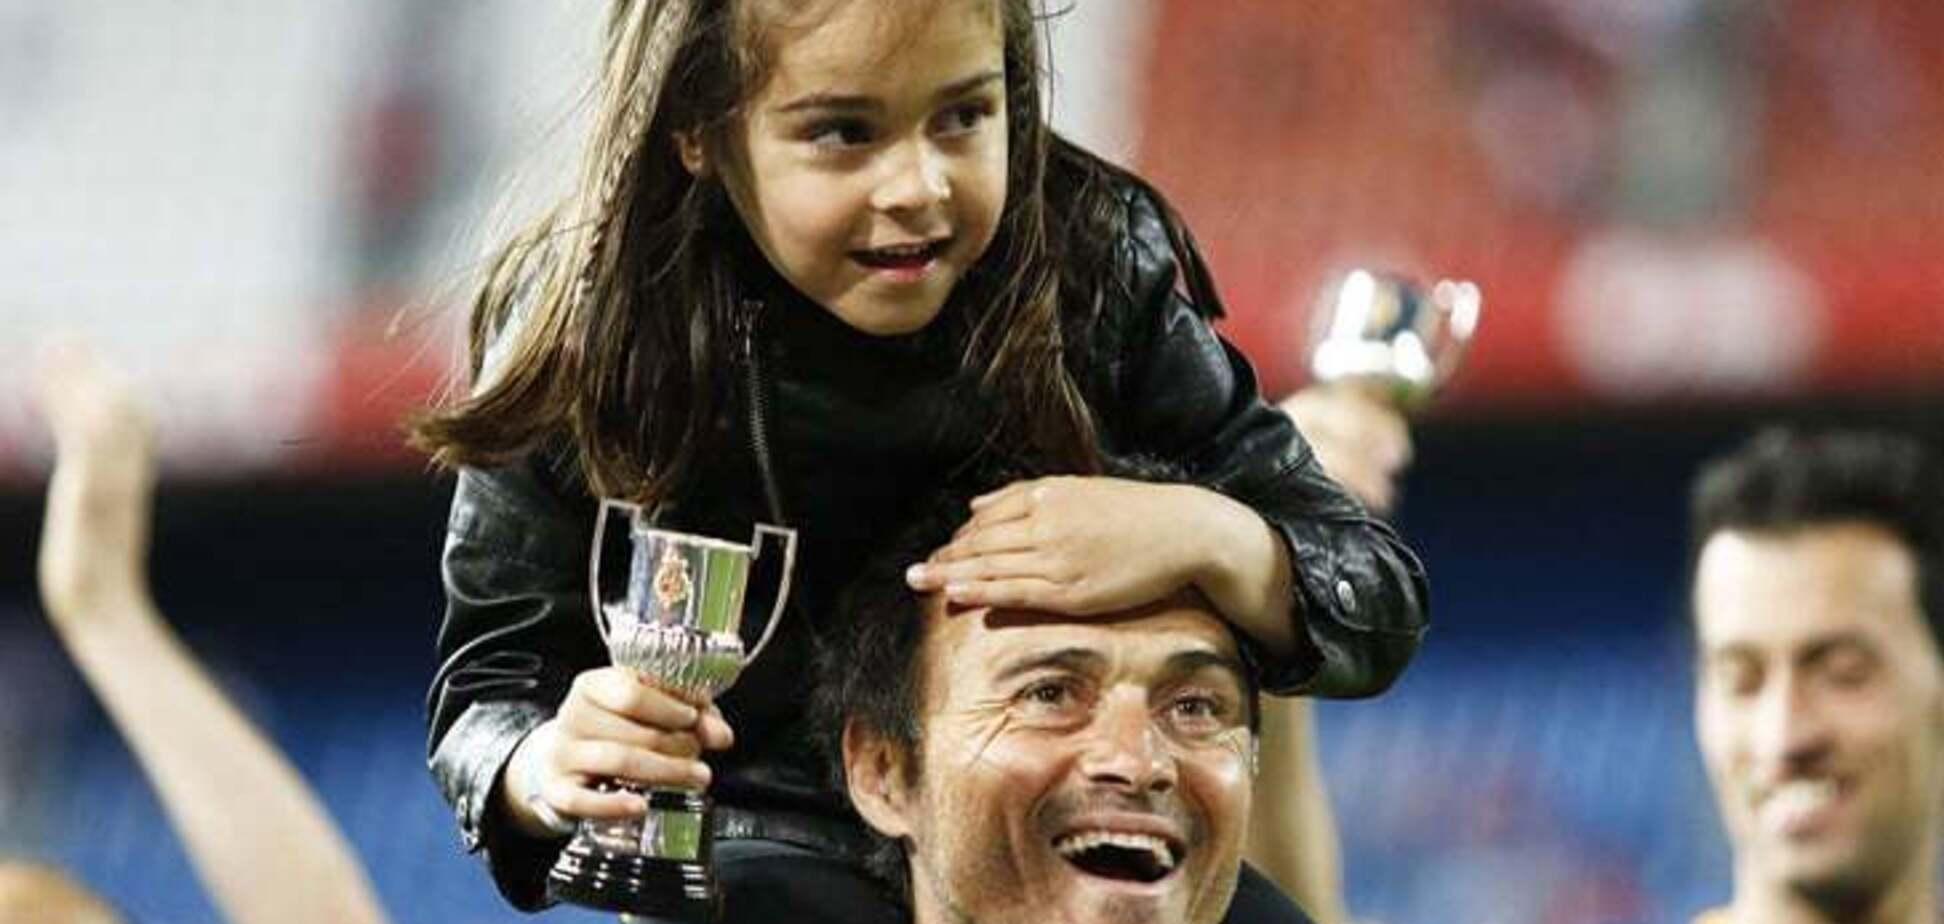 У легенди 'Барселони' померла 9-річна донька